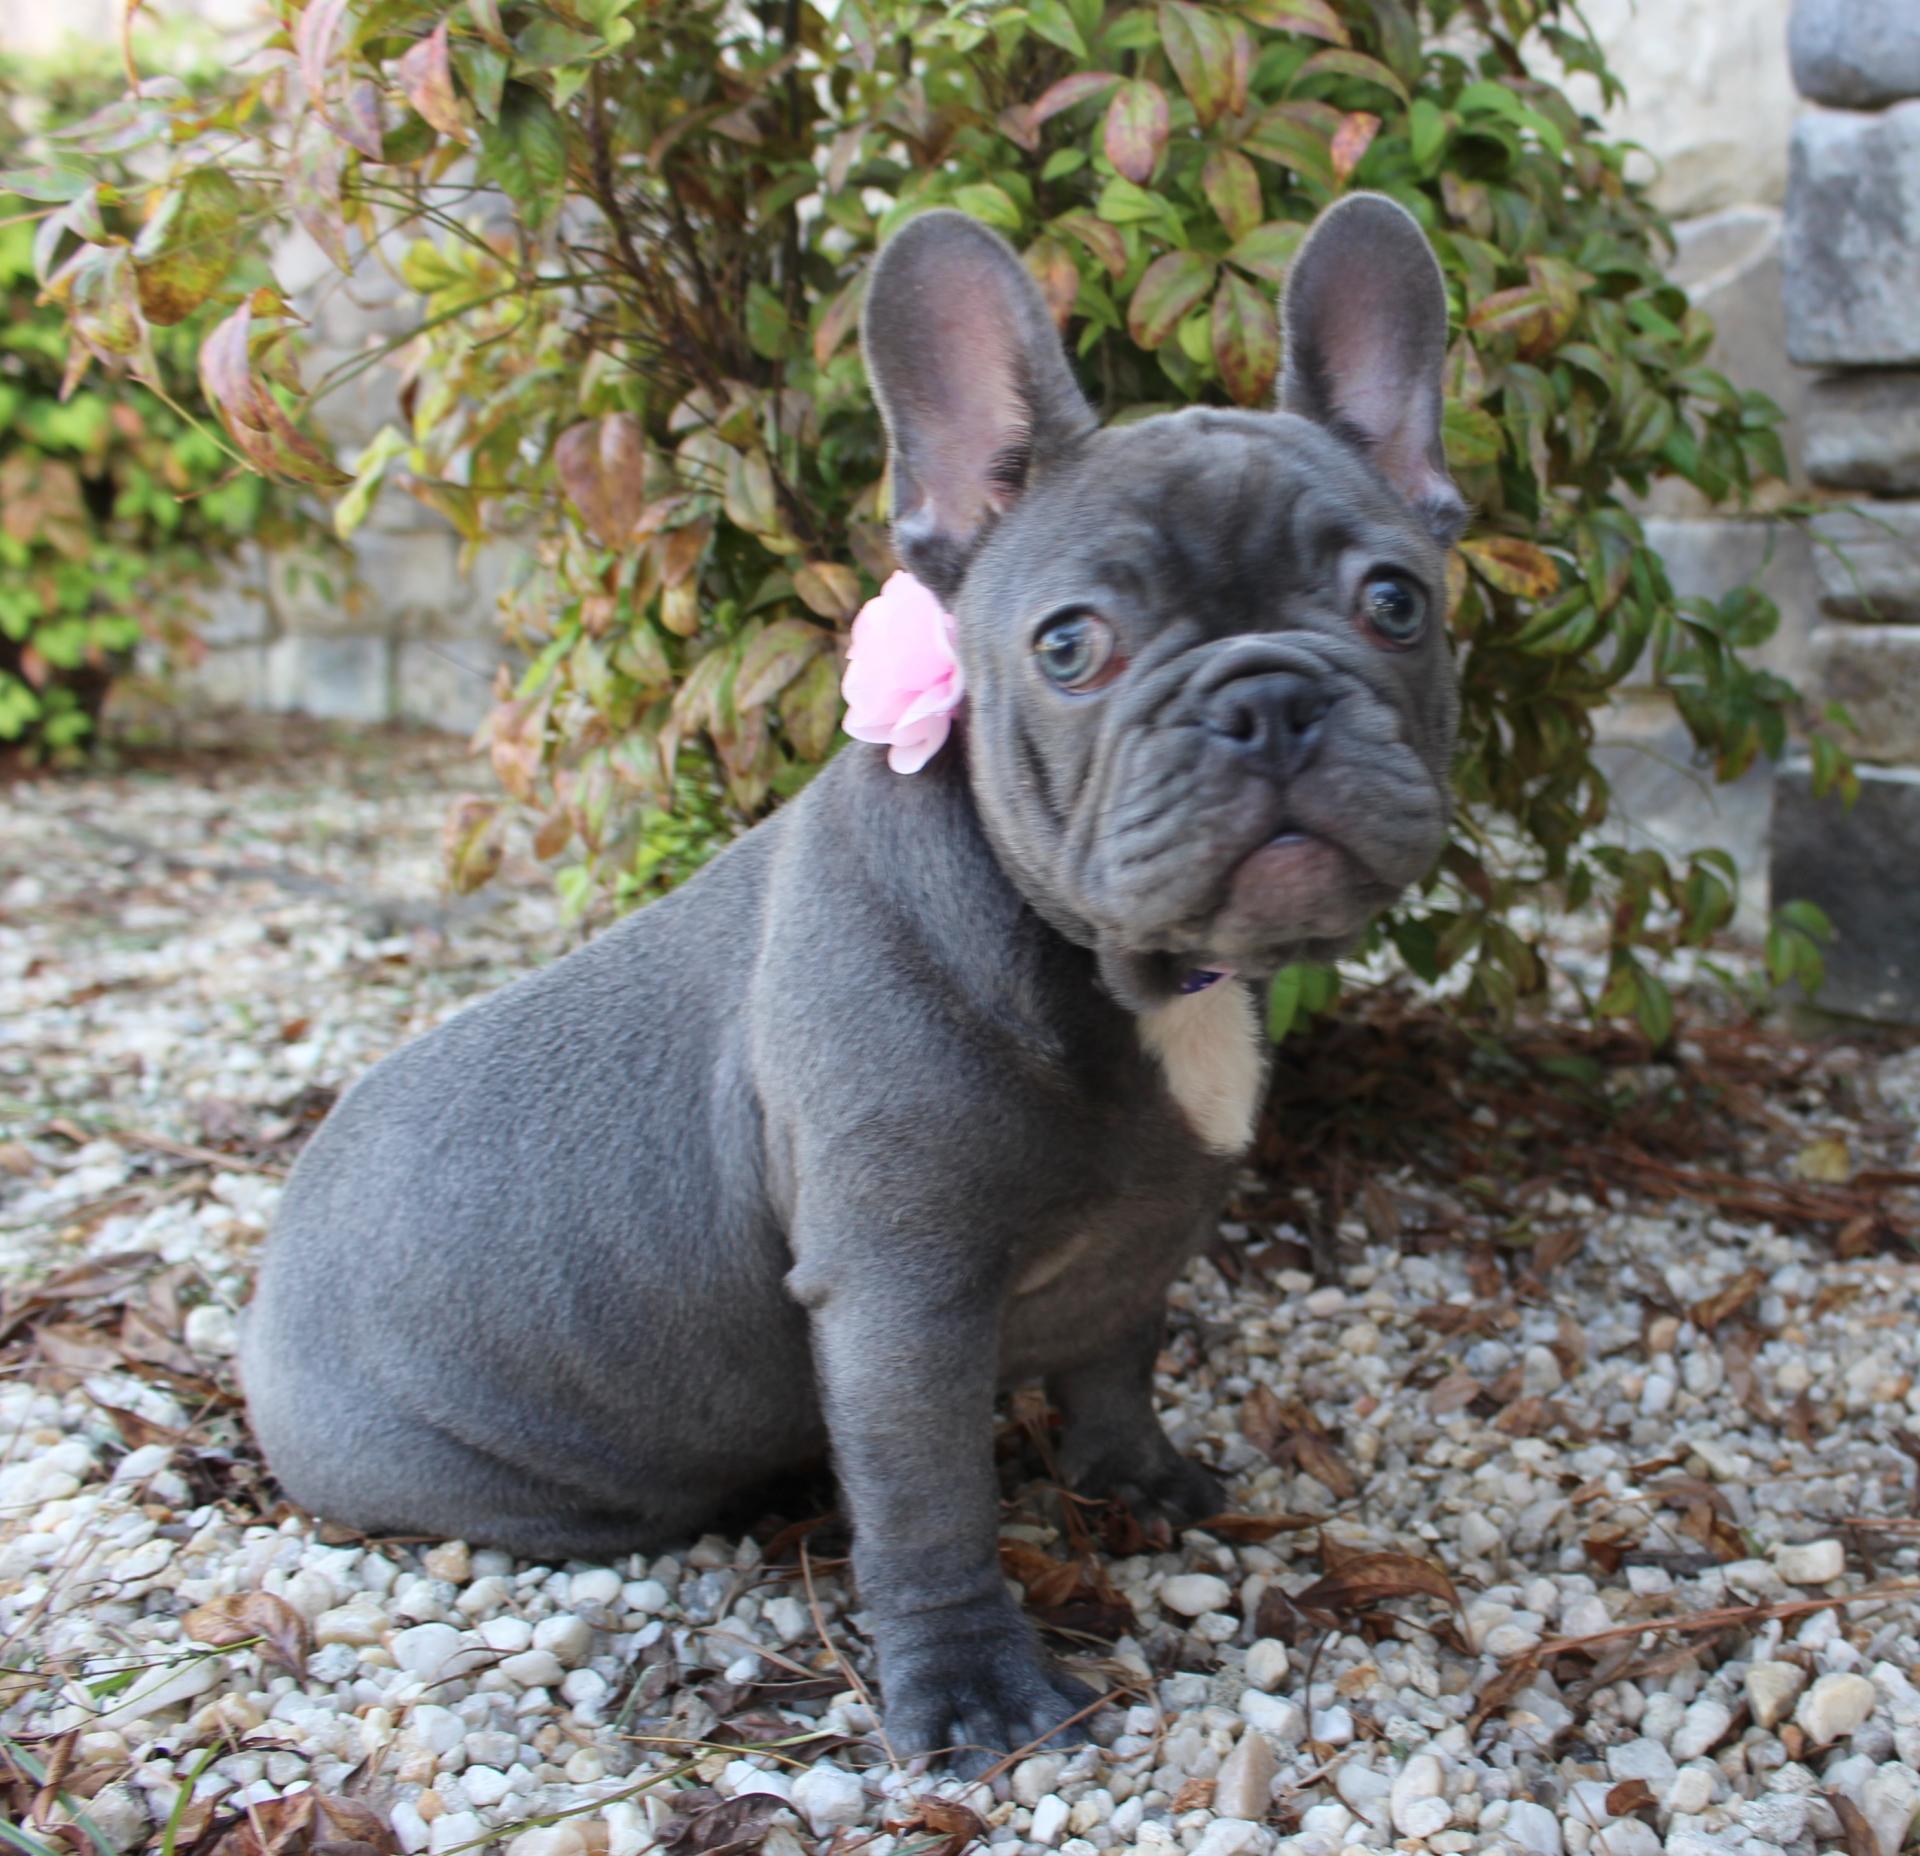 #FrenchBulldog #LilacFrenchBulldog #FrenchBulldogPup